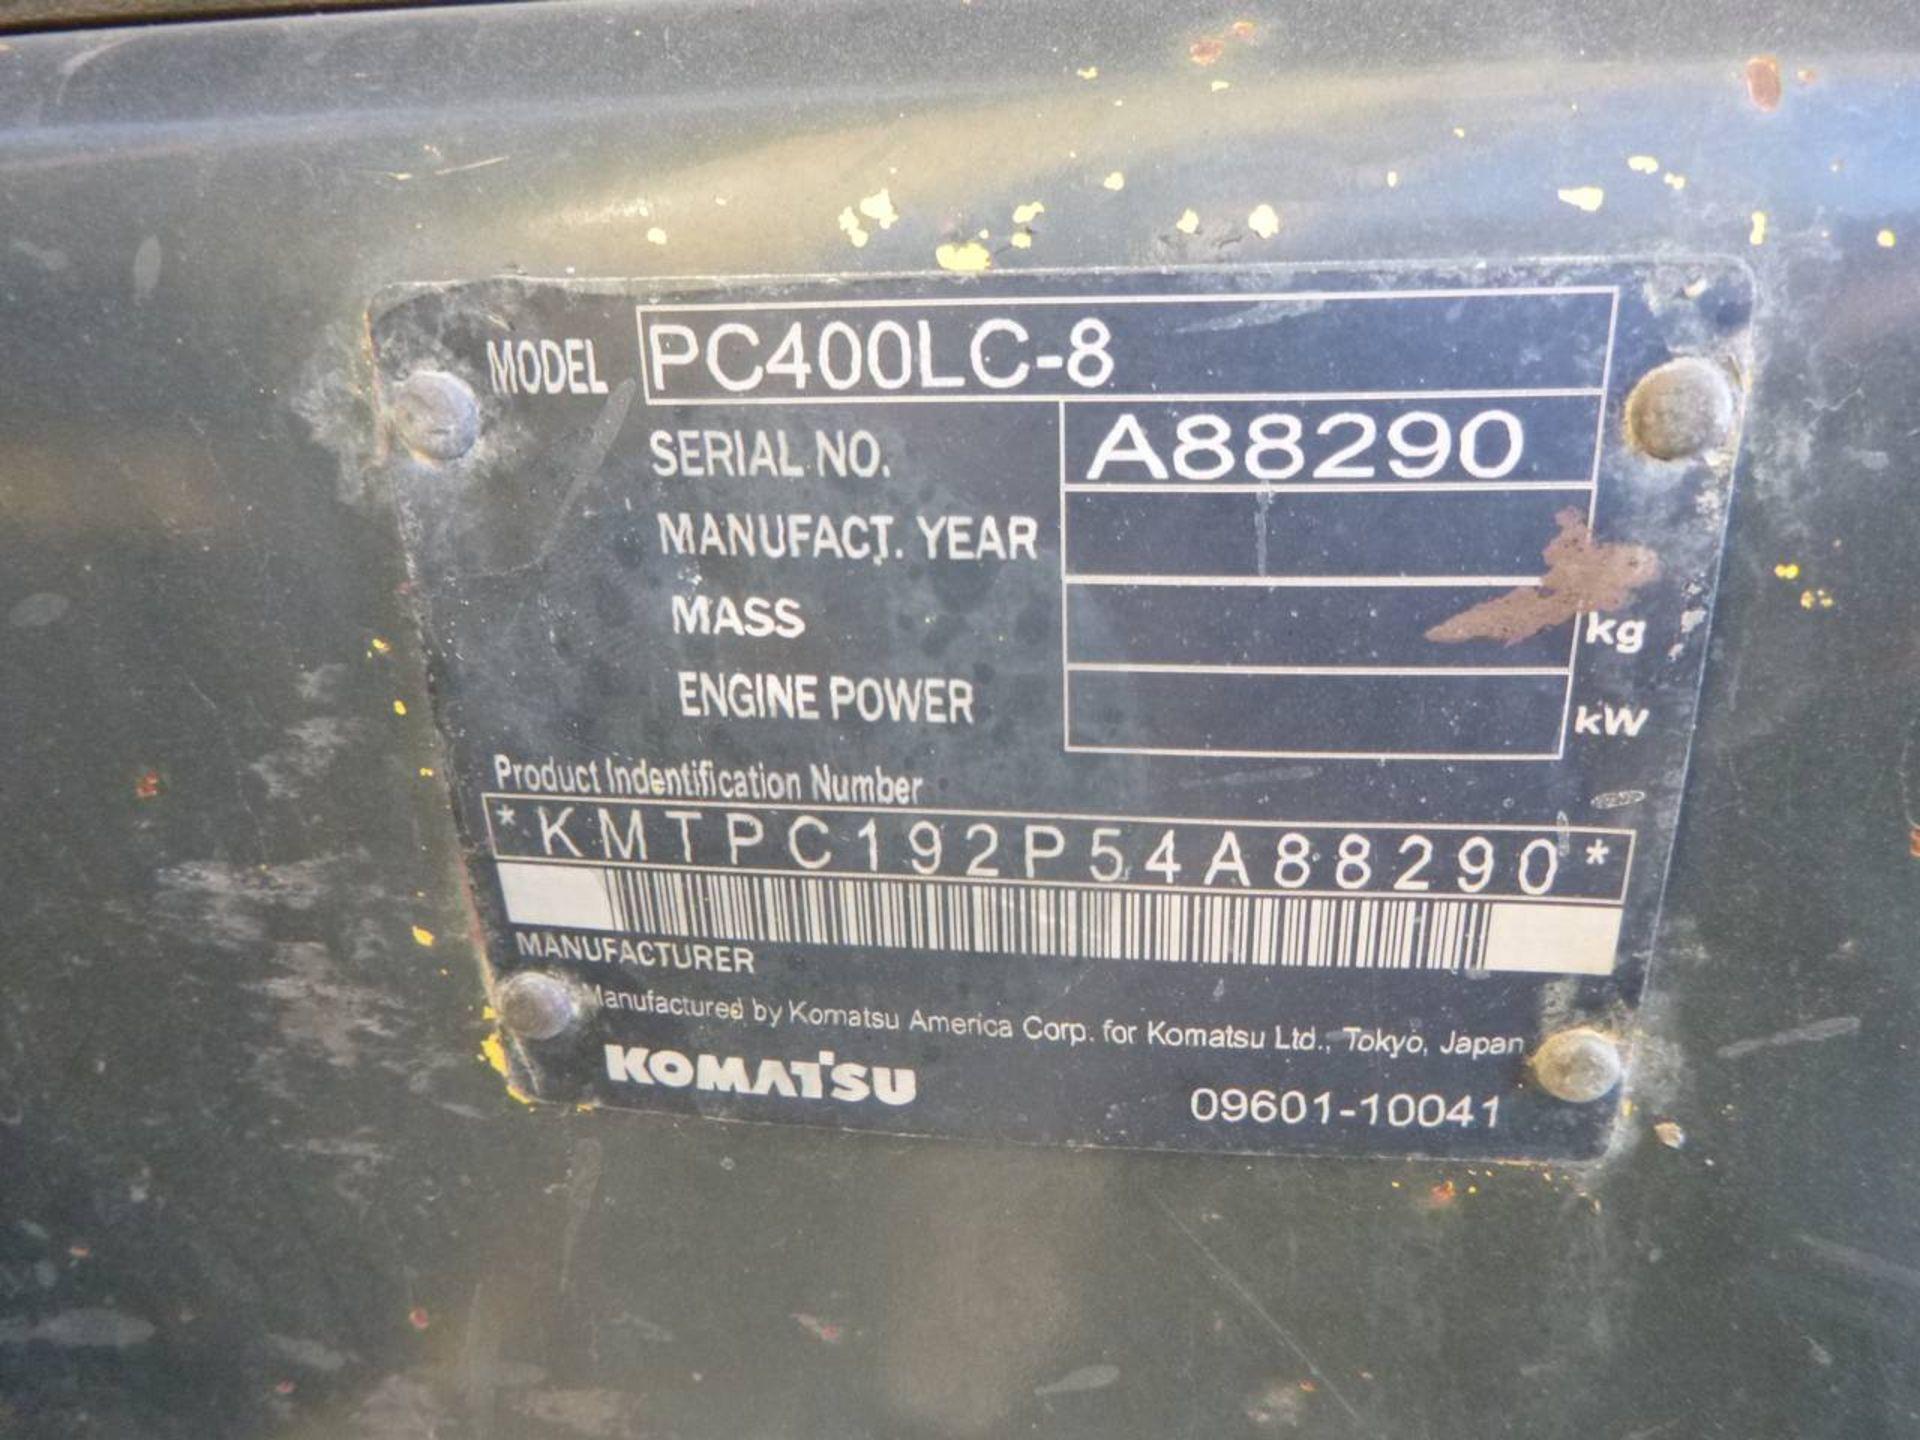 2008 Komatsu PC400LC-8 Excavator - Image 9 of 13